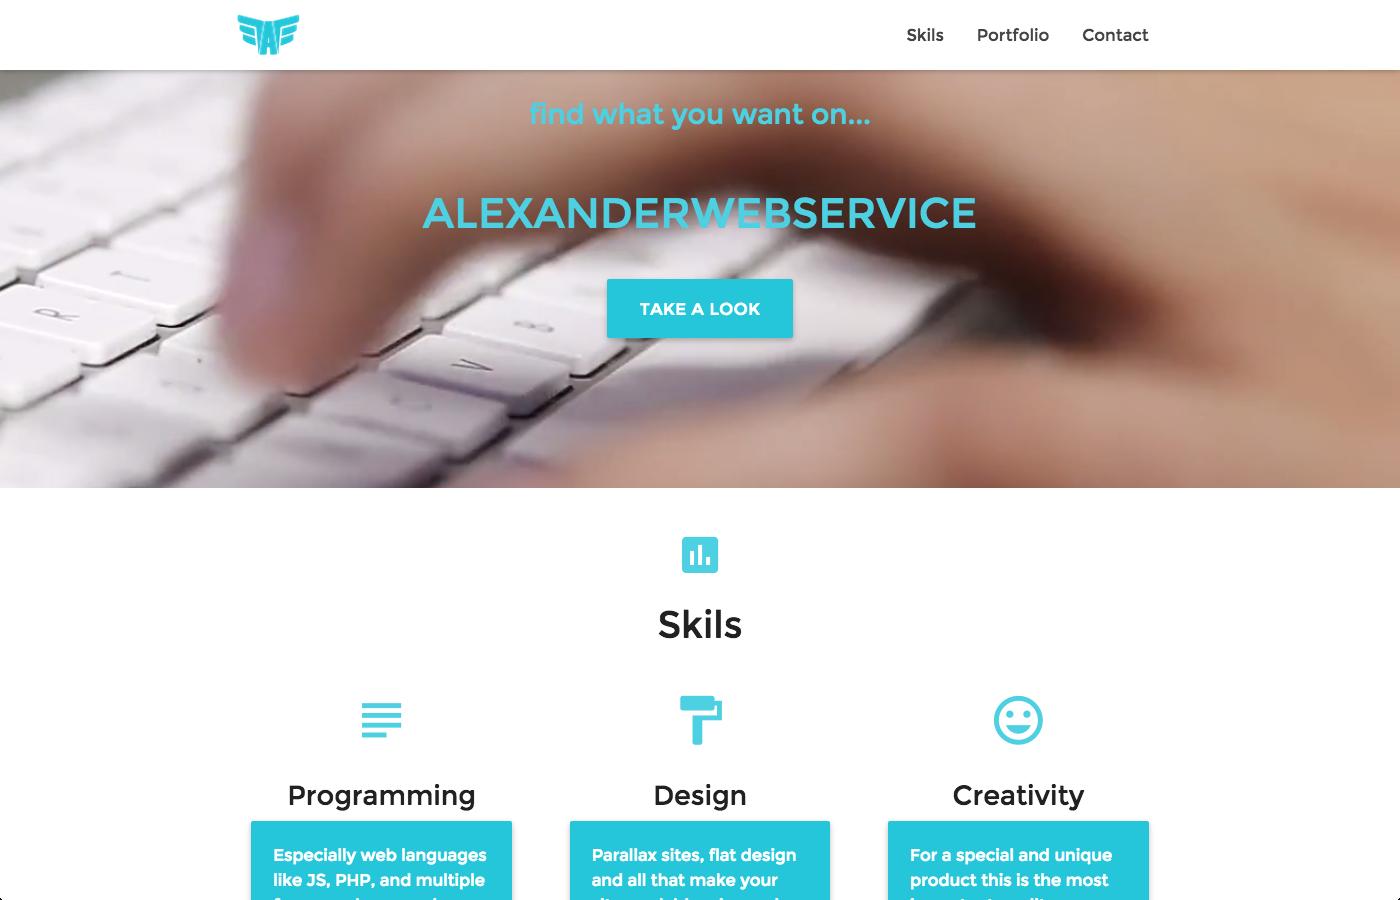 Material design portfolio website by Alexander web service